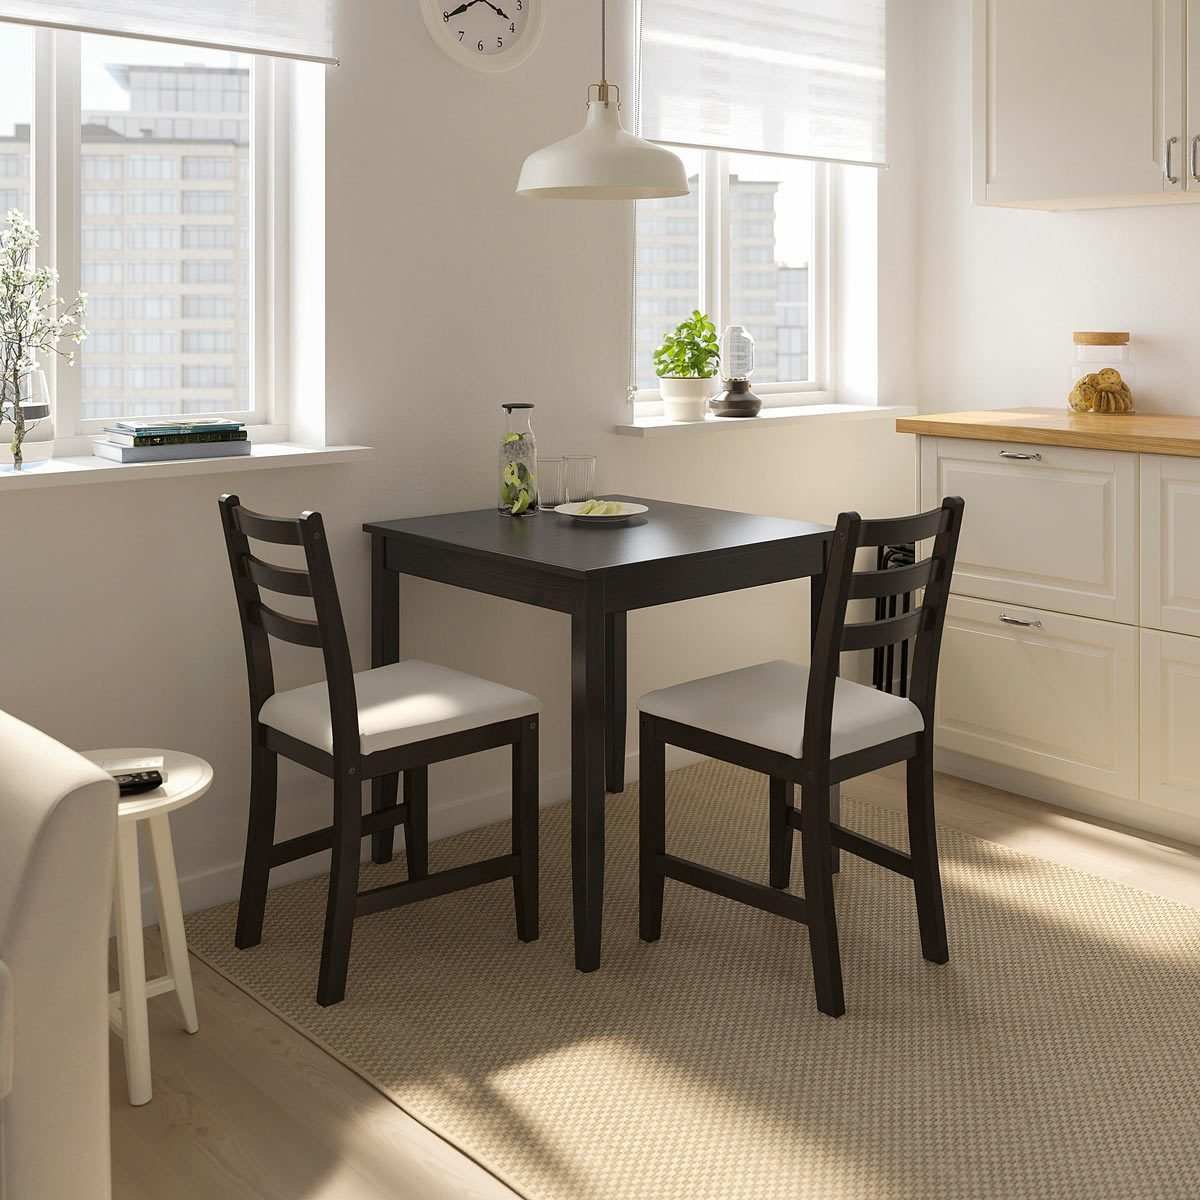 tables kitchen furniture